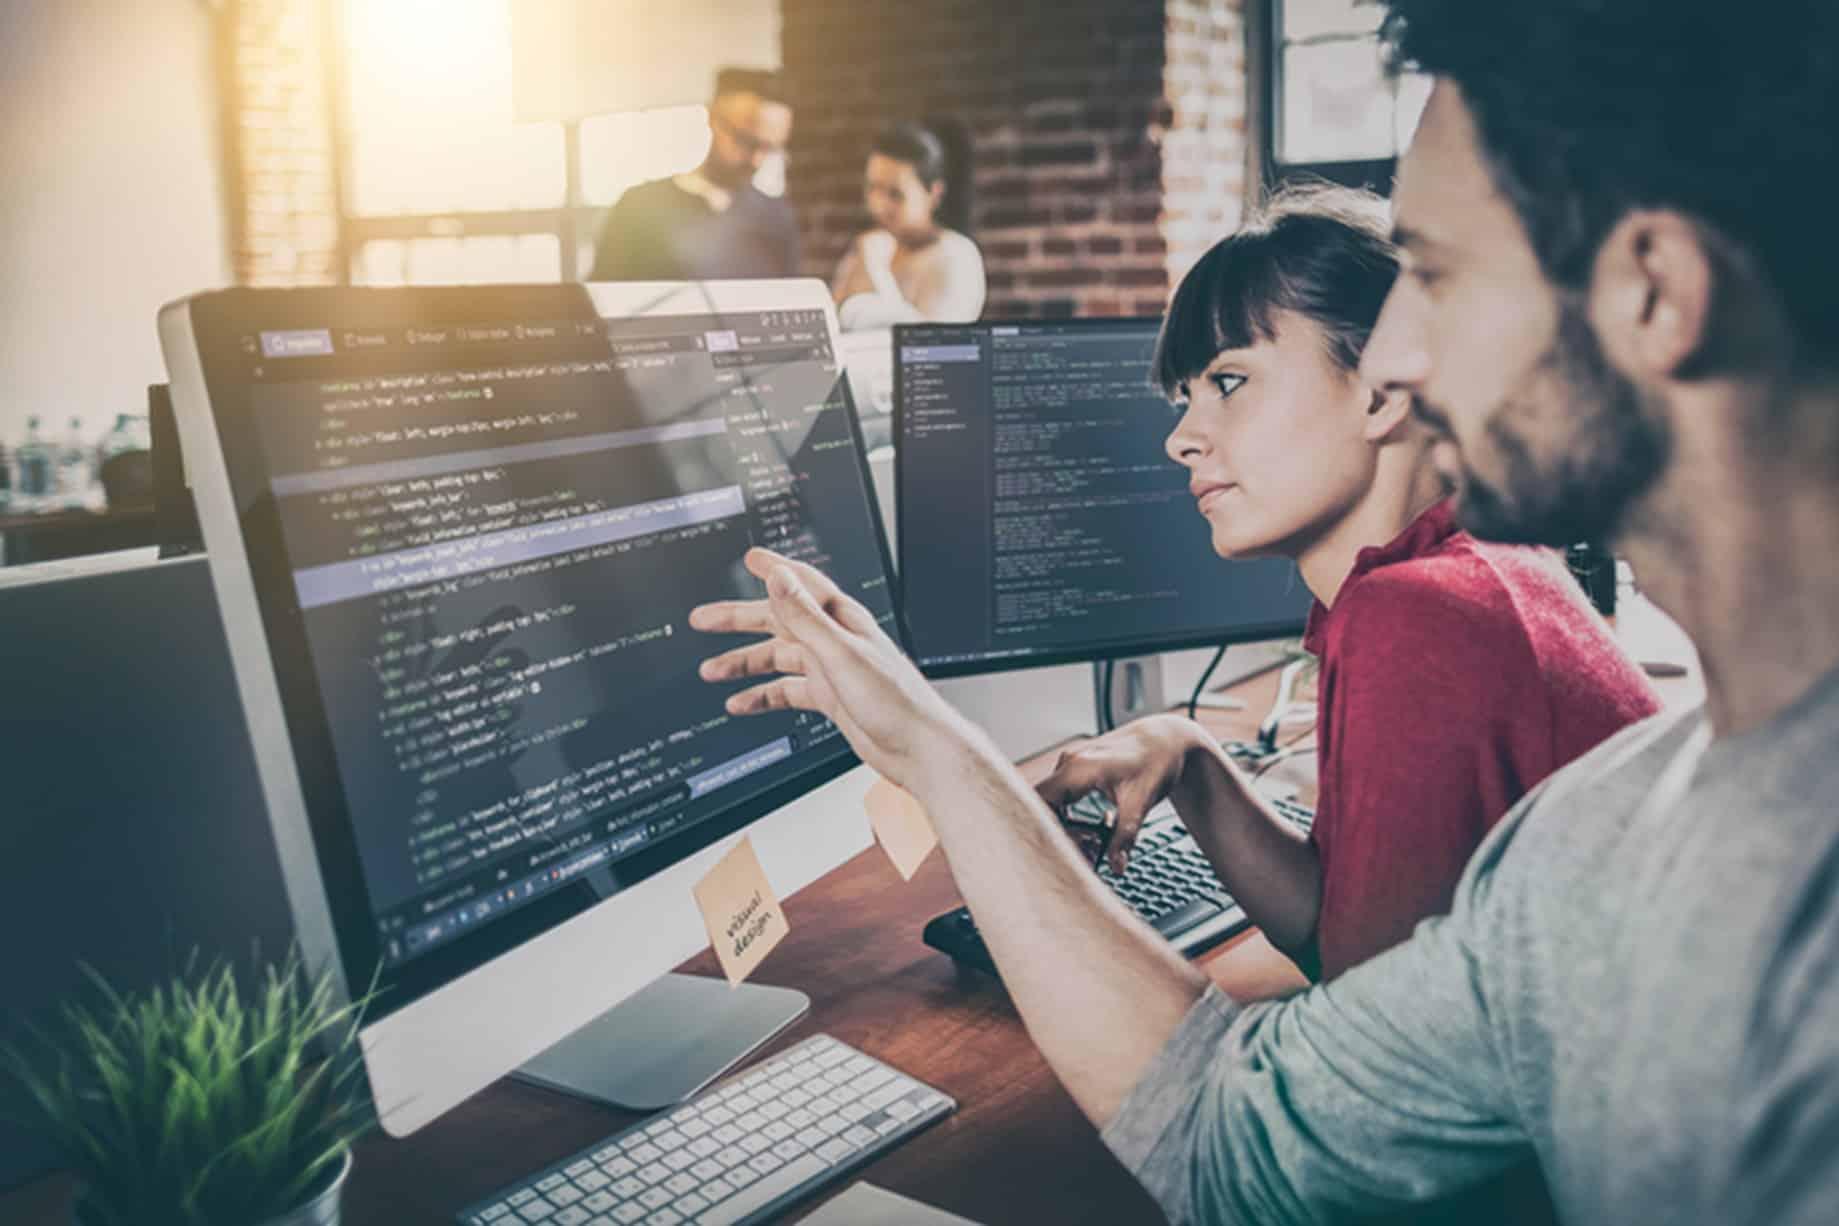 A Lead Developer presenting his code in a computer